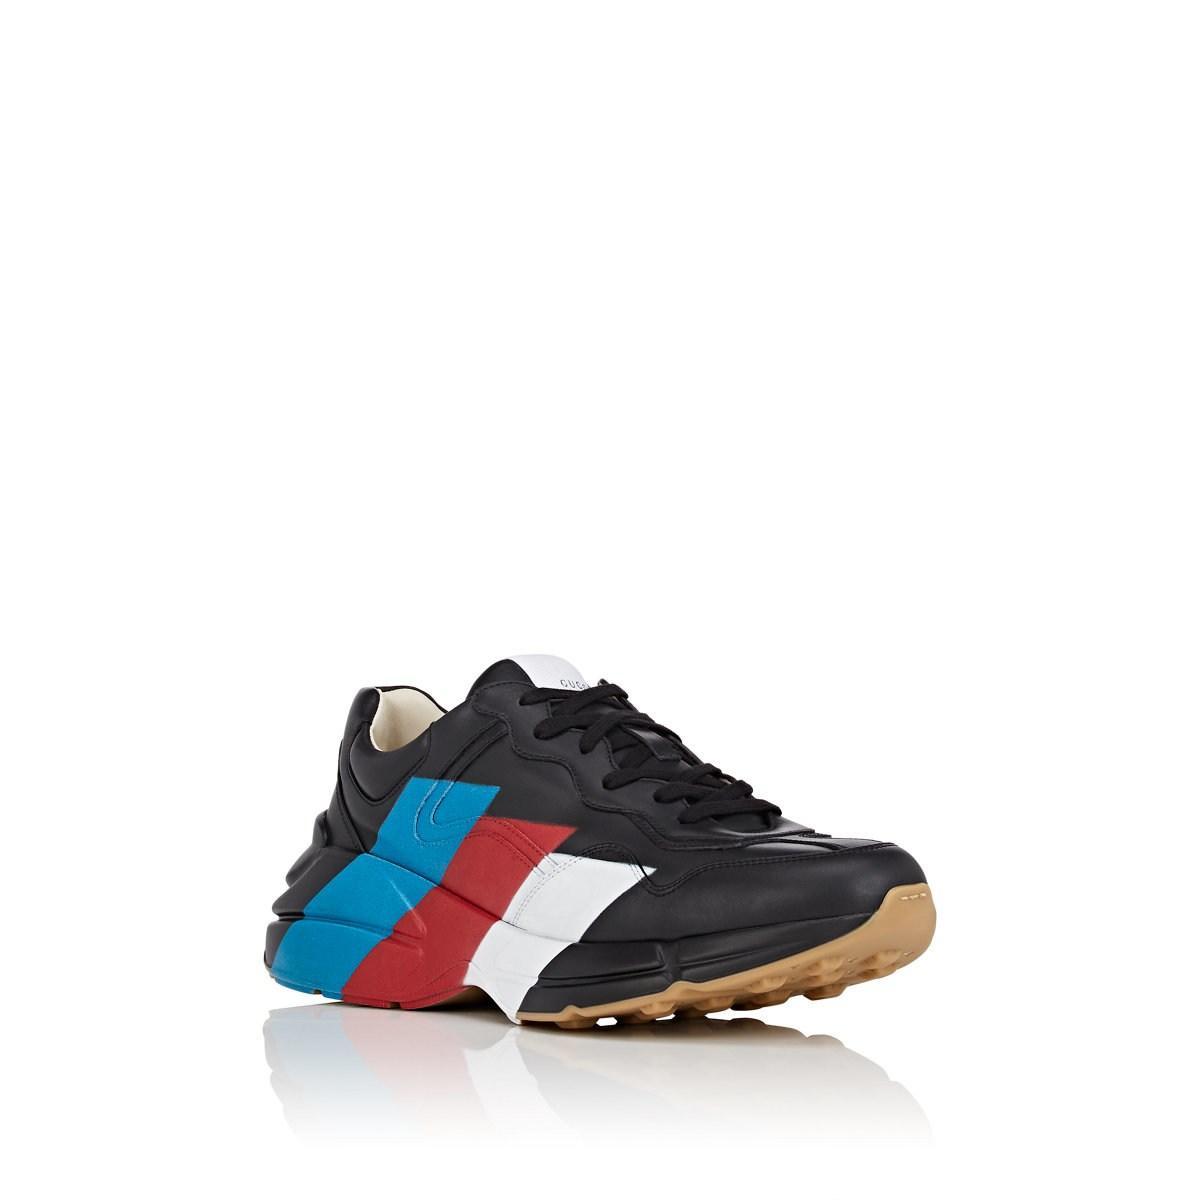 8d8431711f0149 Gucci - Black Rhyton Web Print Leather Sneaker for Men - Lyst. View  fullscreen